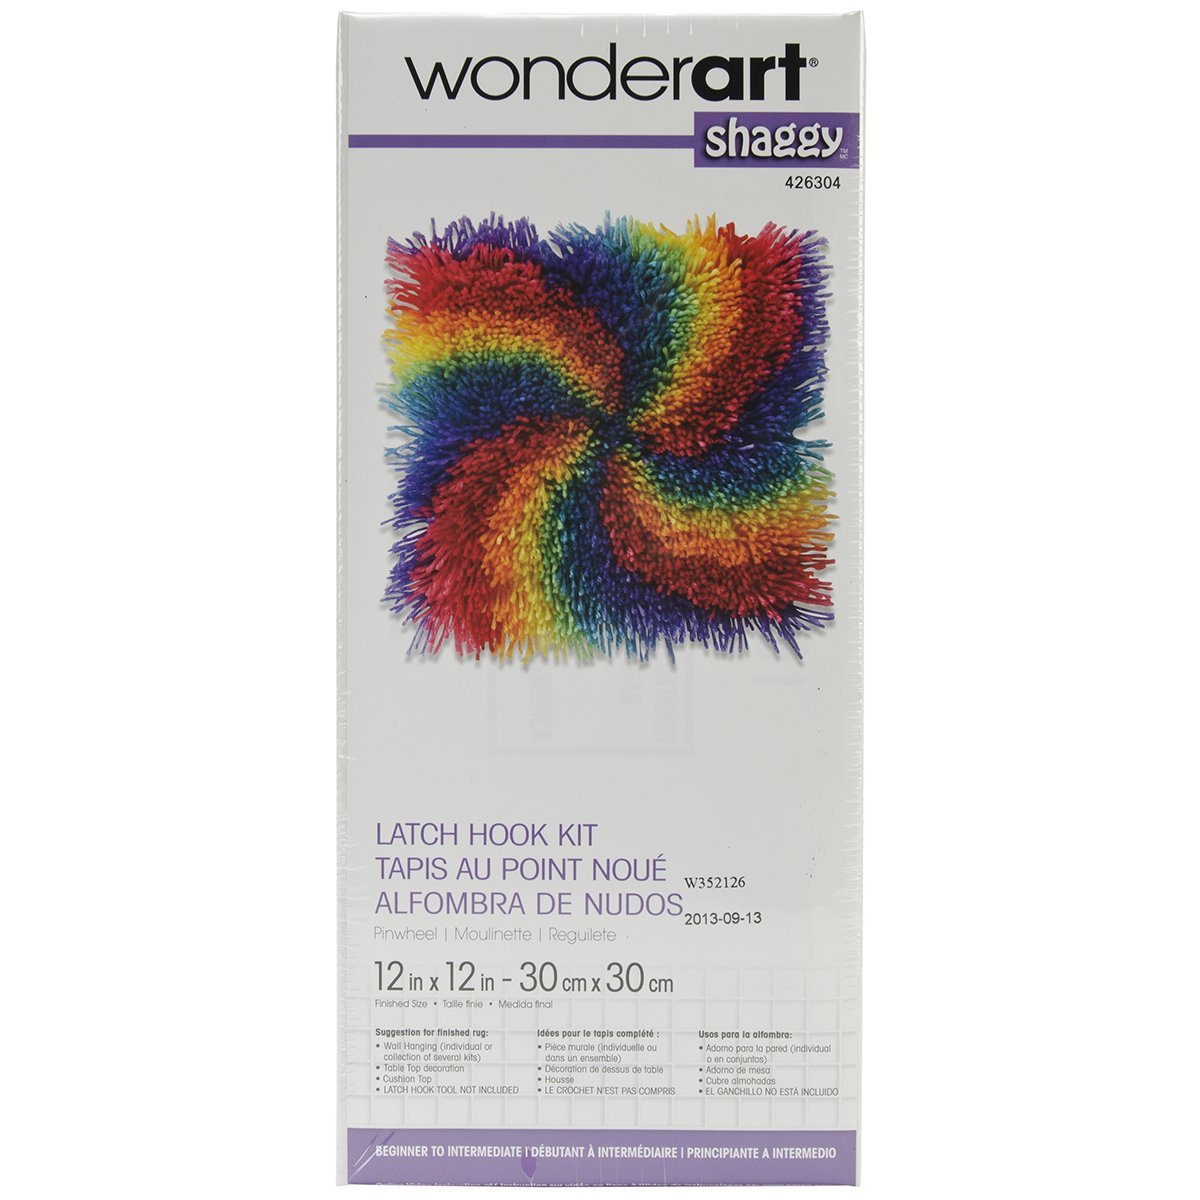 Spinrite Wonderart Shaggy Star Latch Hook Kit, 12